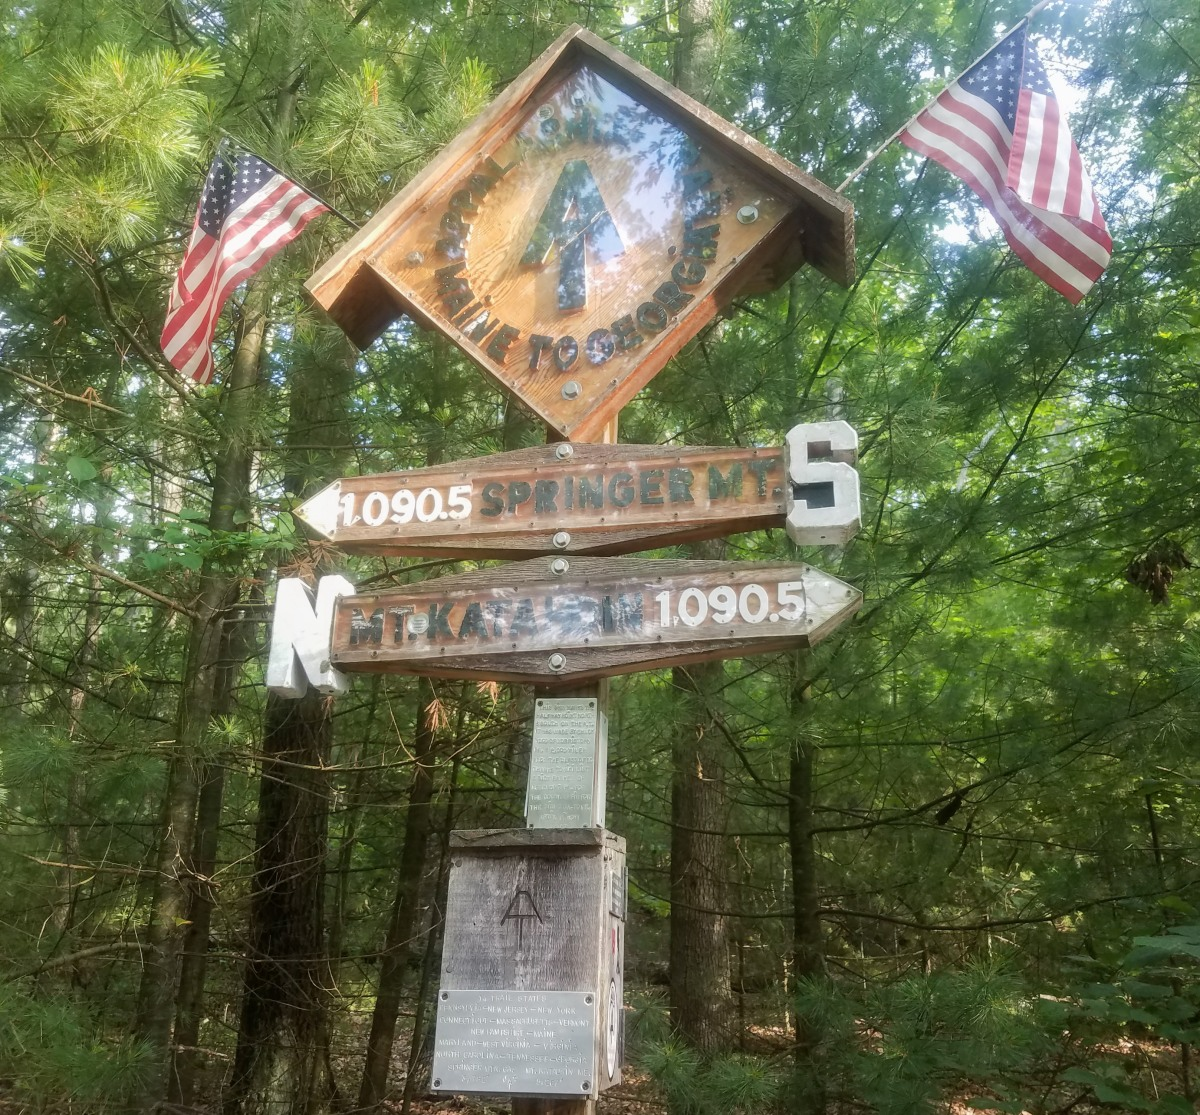 1,147 miles on the Appalachian Trail: Halfwaythere